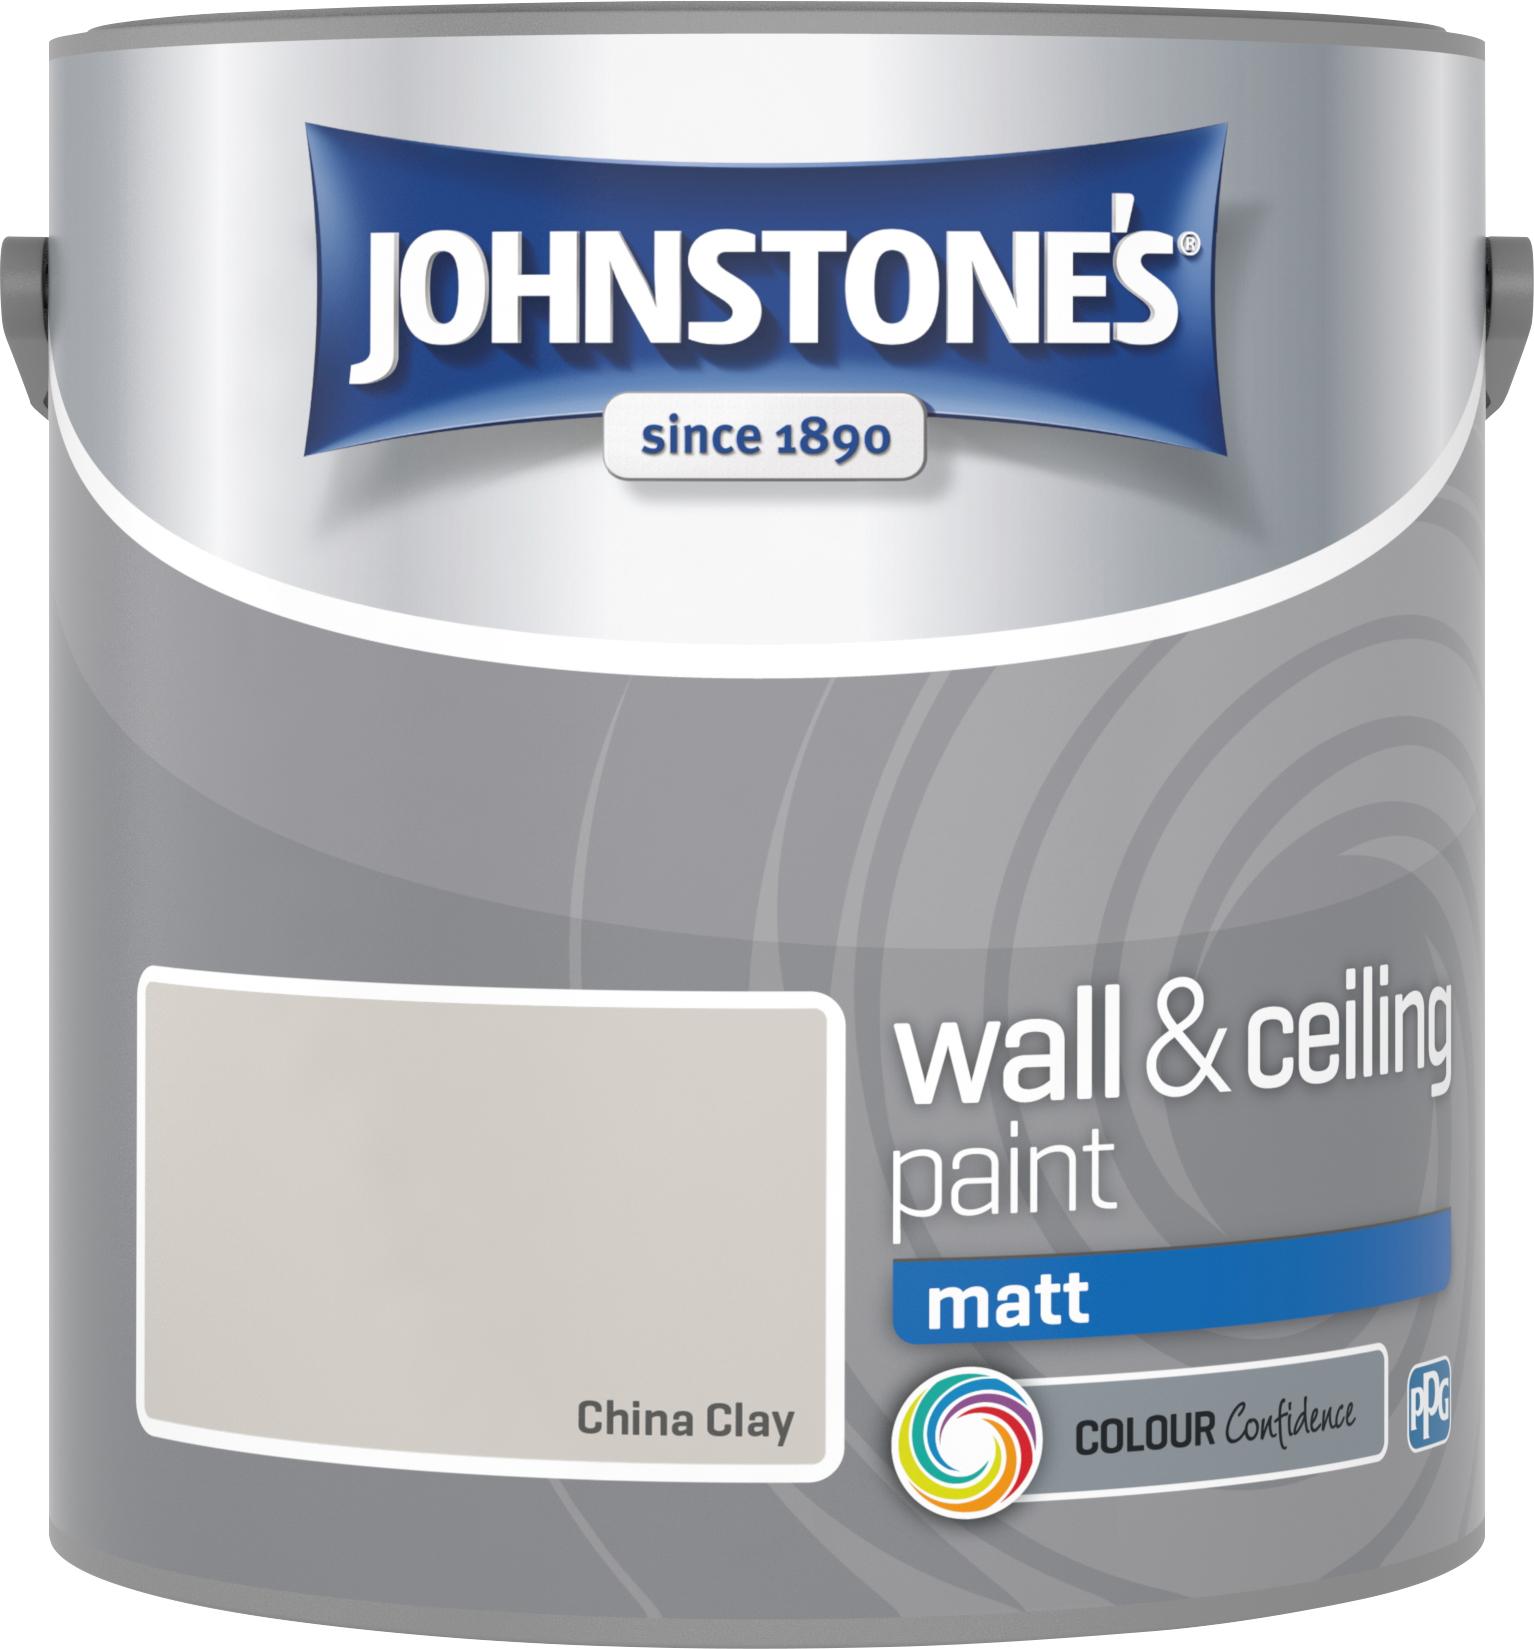 Johnstone's 304013 2.5 Litre Matt Emulsion Paint - China Clay